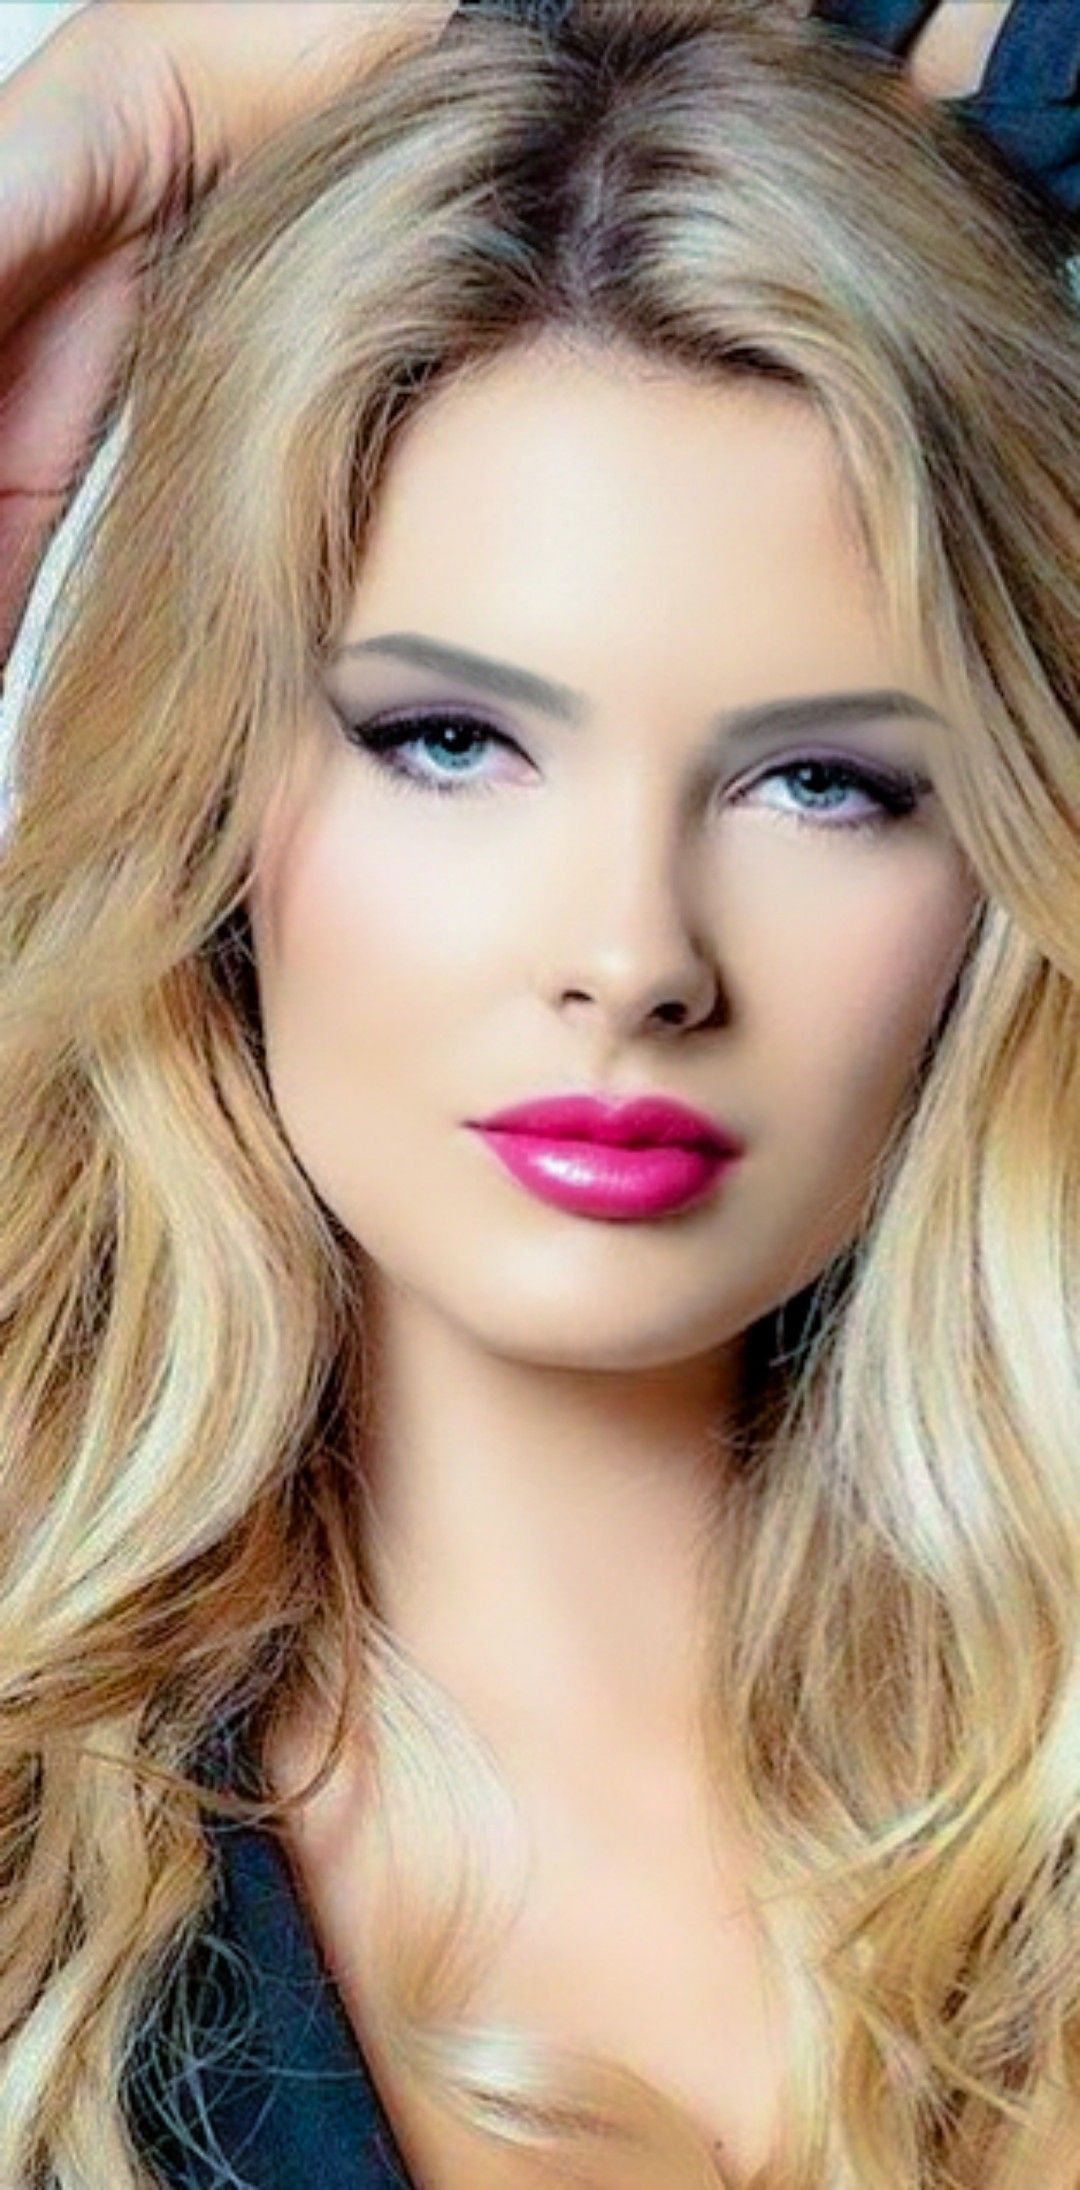 Pin By Jesus Maria Nino Quinones On Bonitas In 2019 Blonde Hair